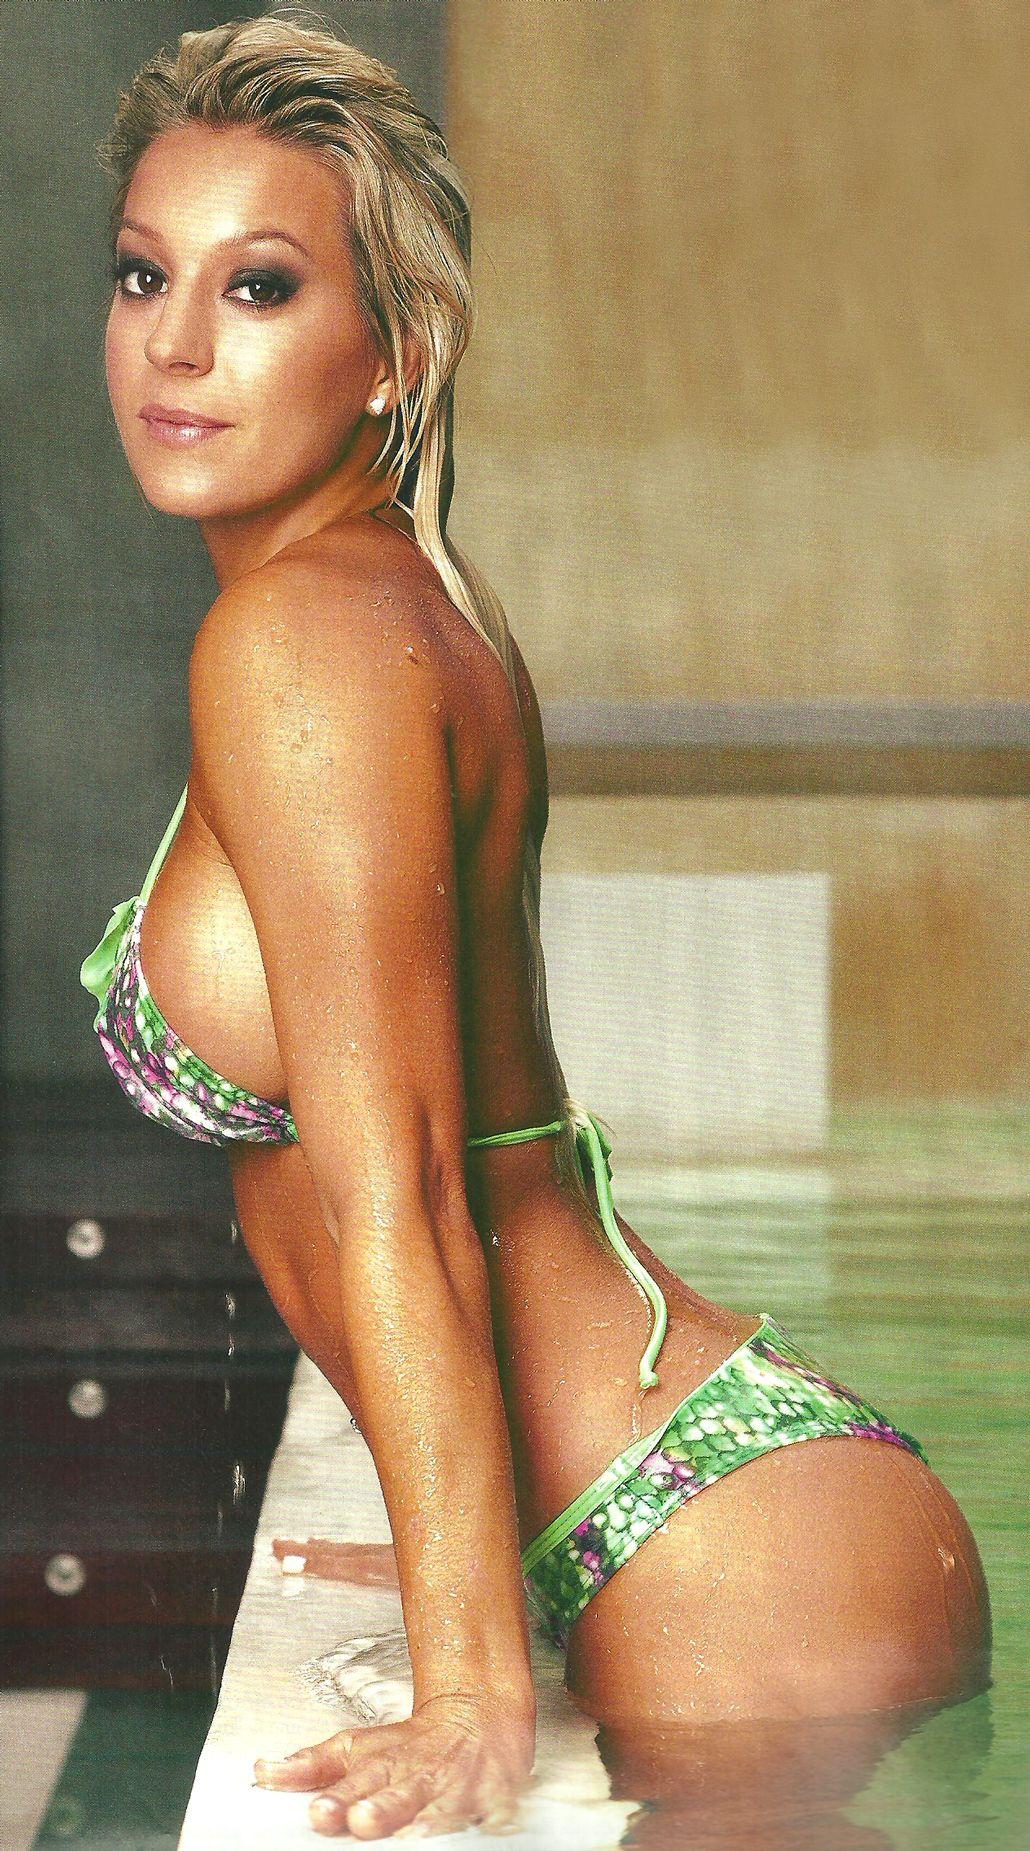 Amber midthunde,Iggy Azalea Gets Naked To Save Her Career Hot nude ADULT Amelle Berrabah,VIDEO Charlotte Perrelli